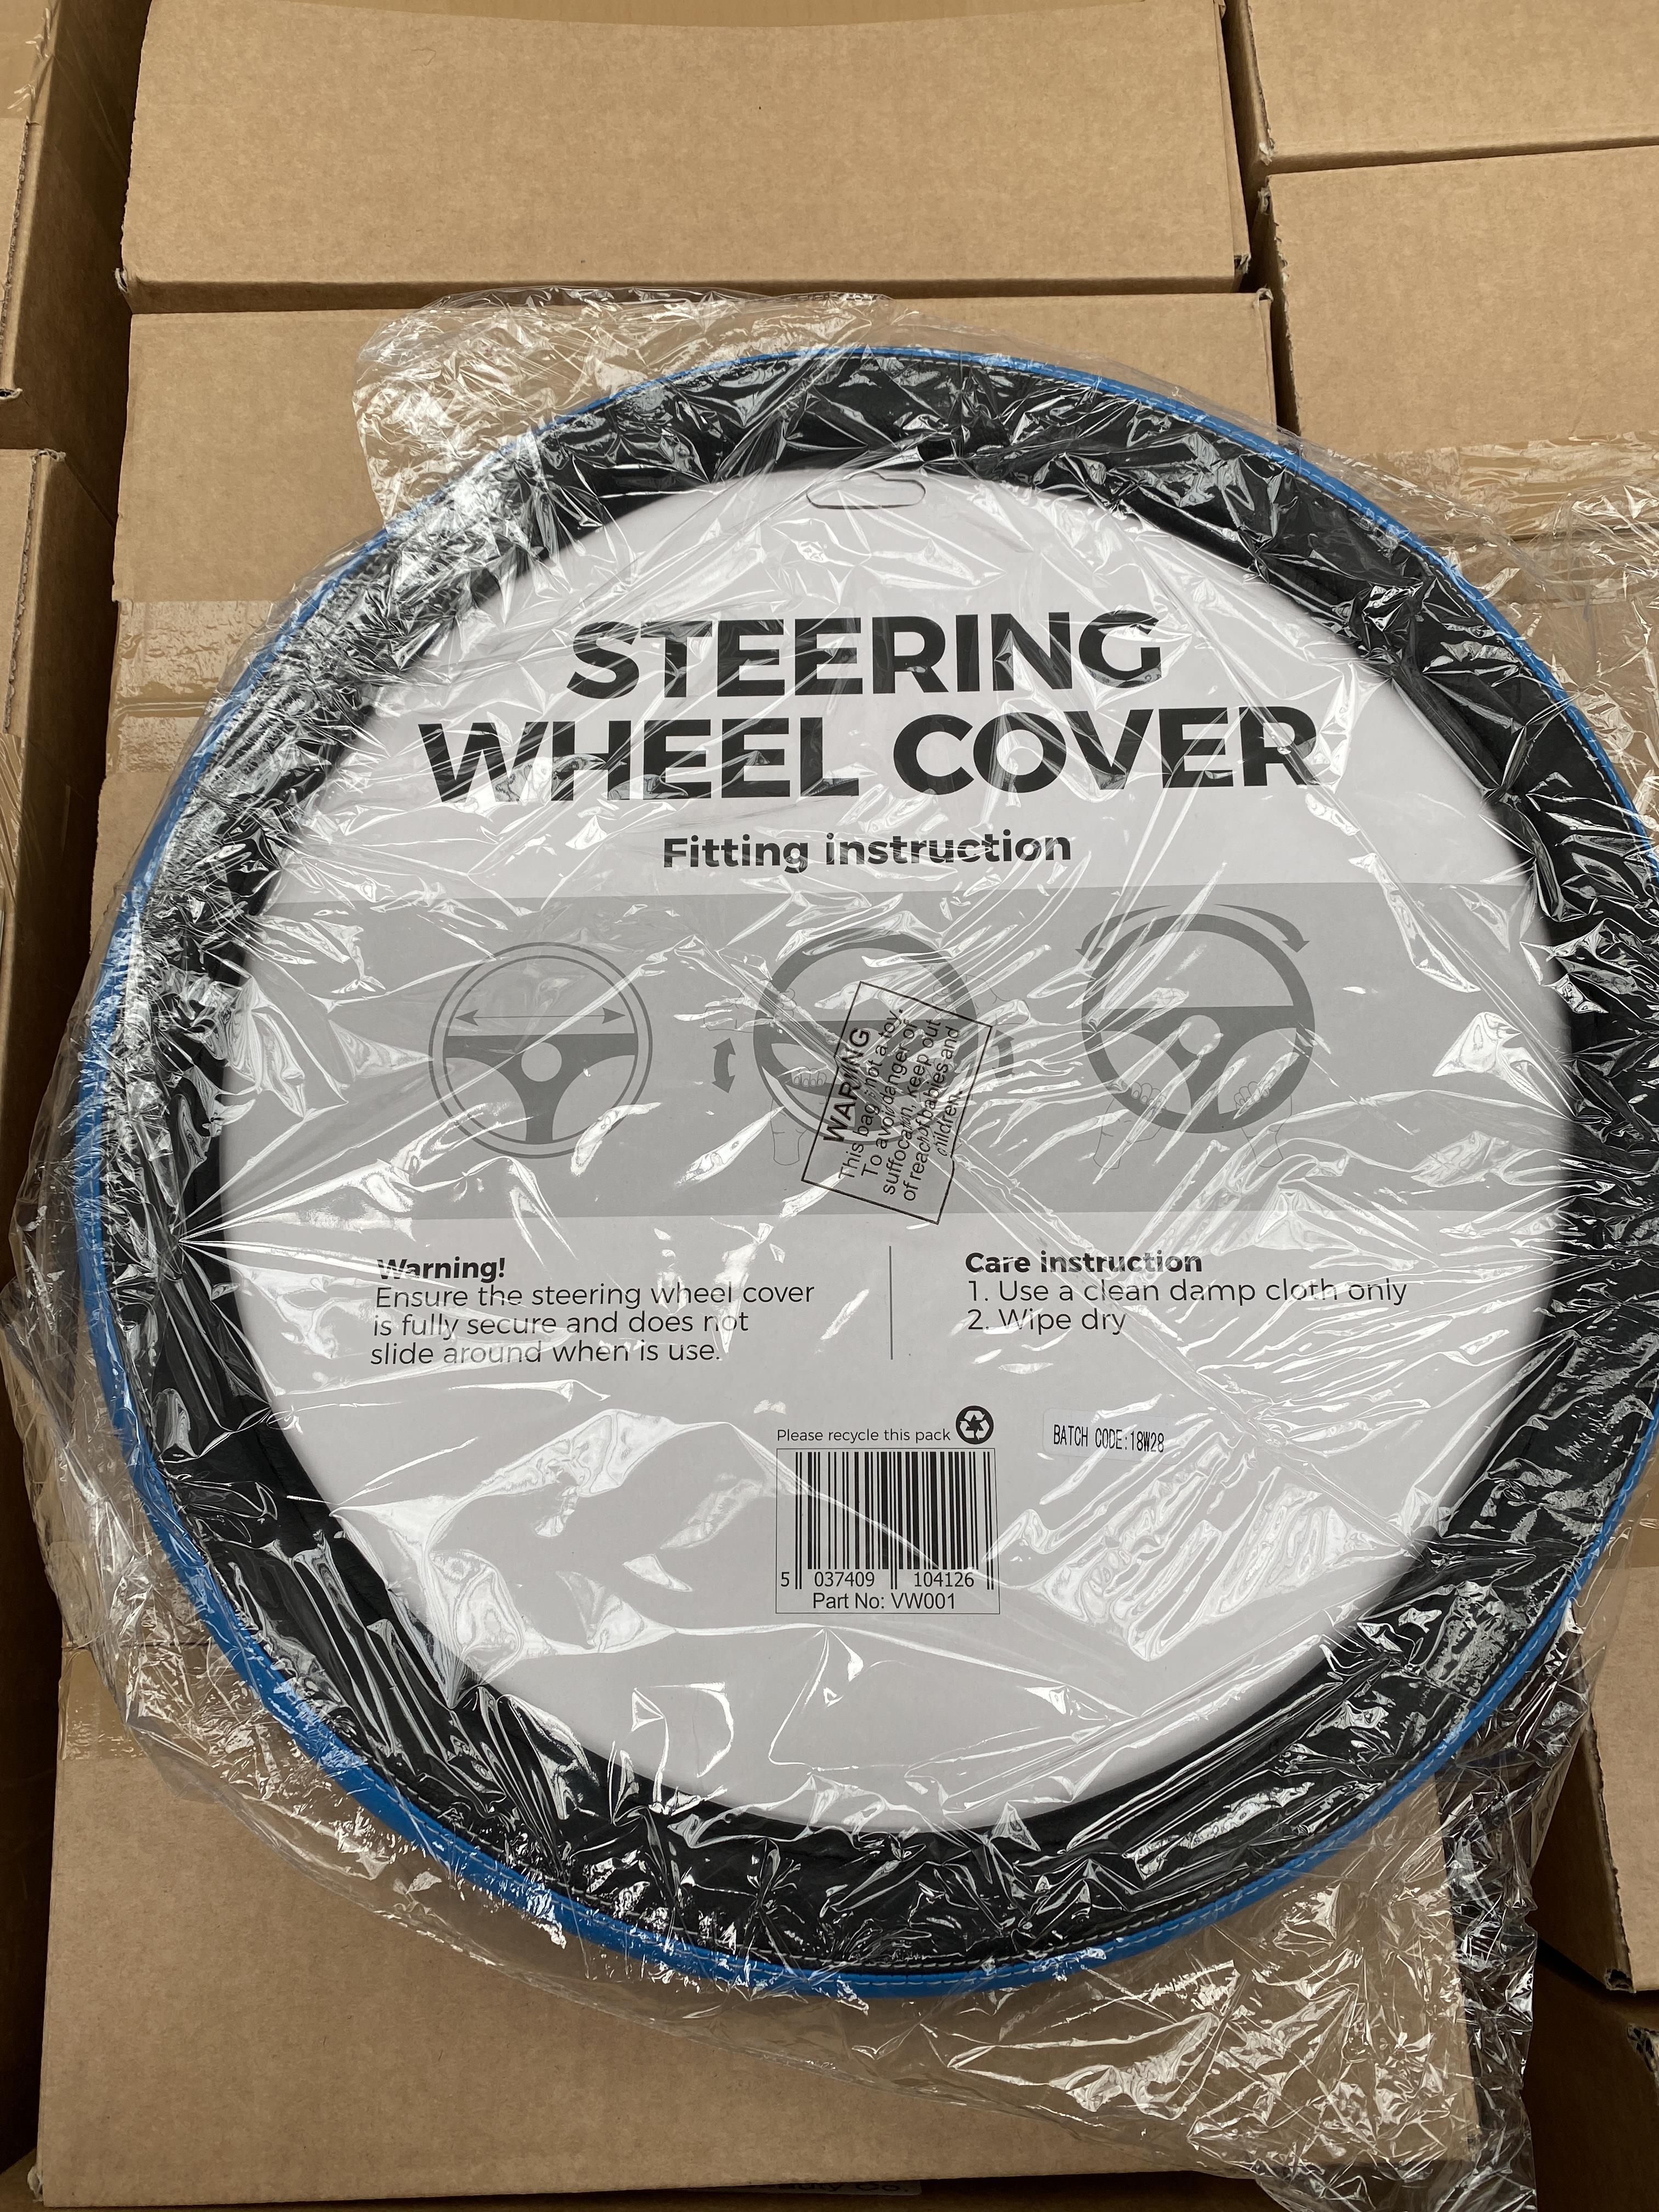 60 x HALFORDS steering wheel cover. Full RRP £480 plus - Image 2 of 2